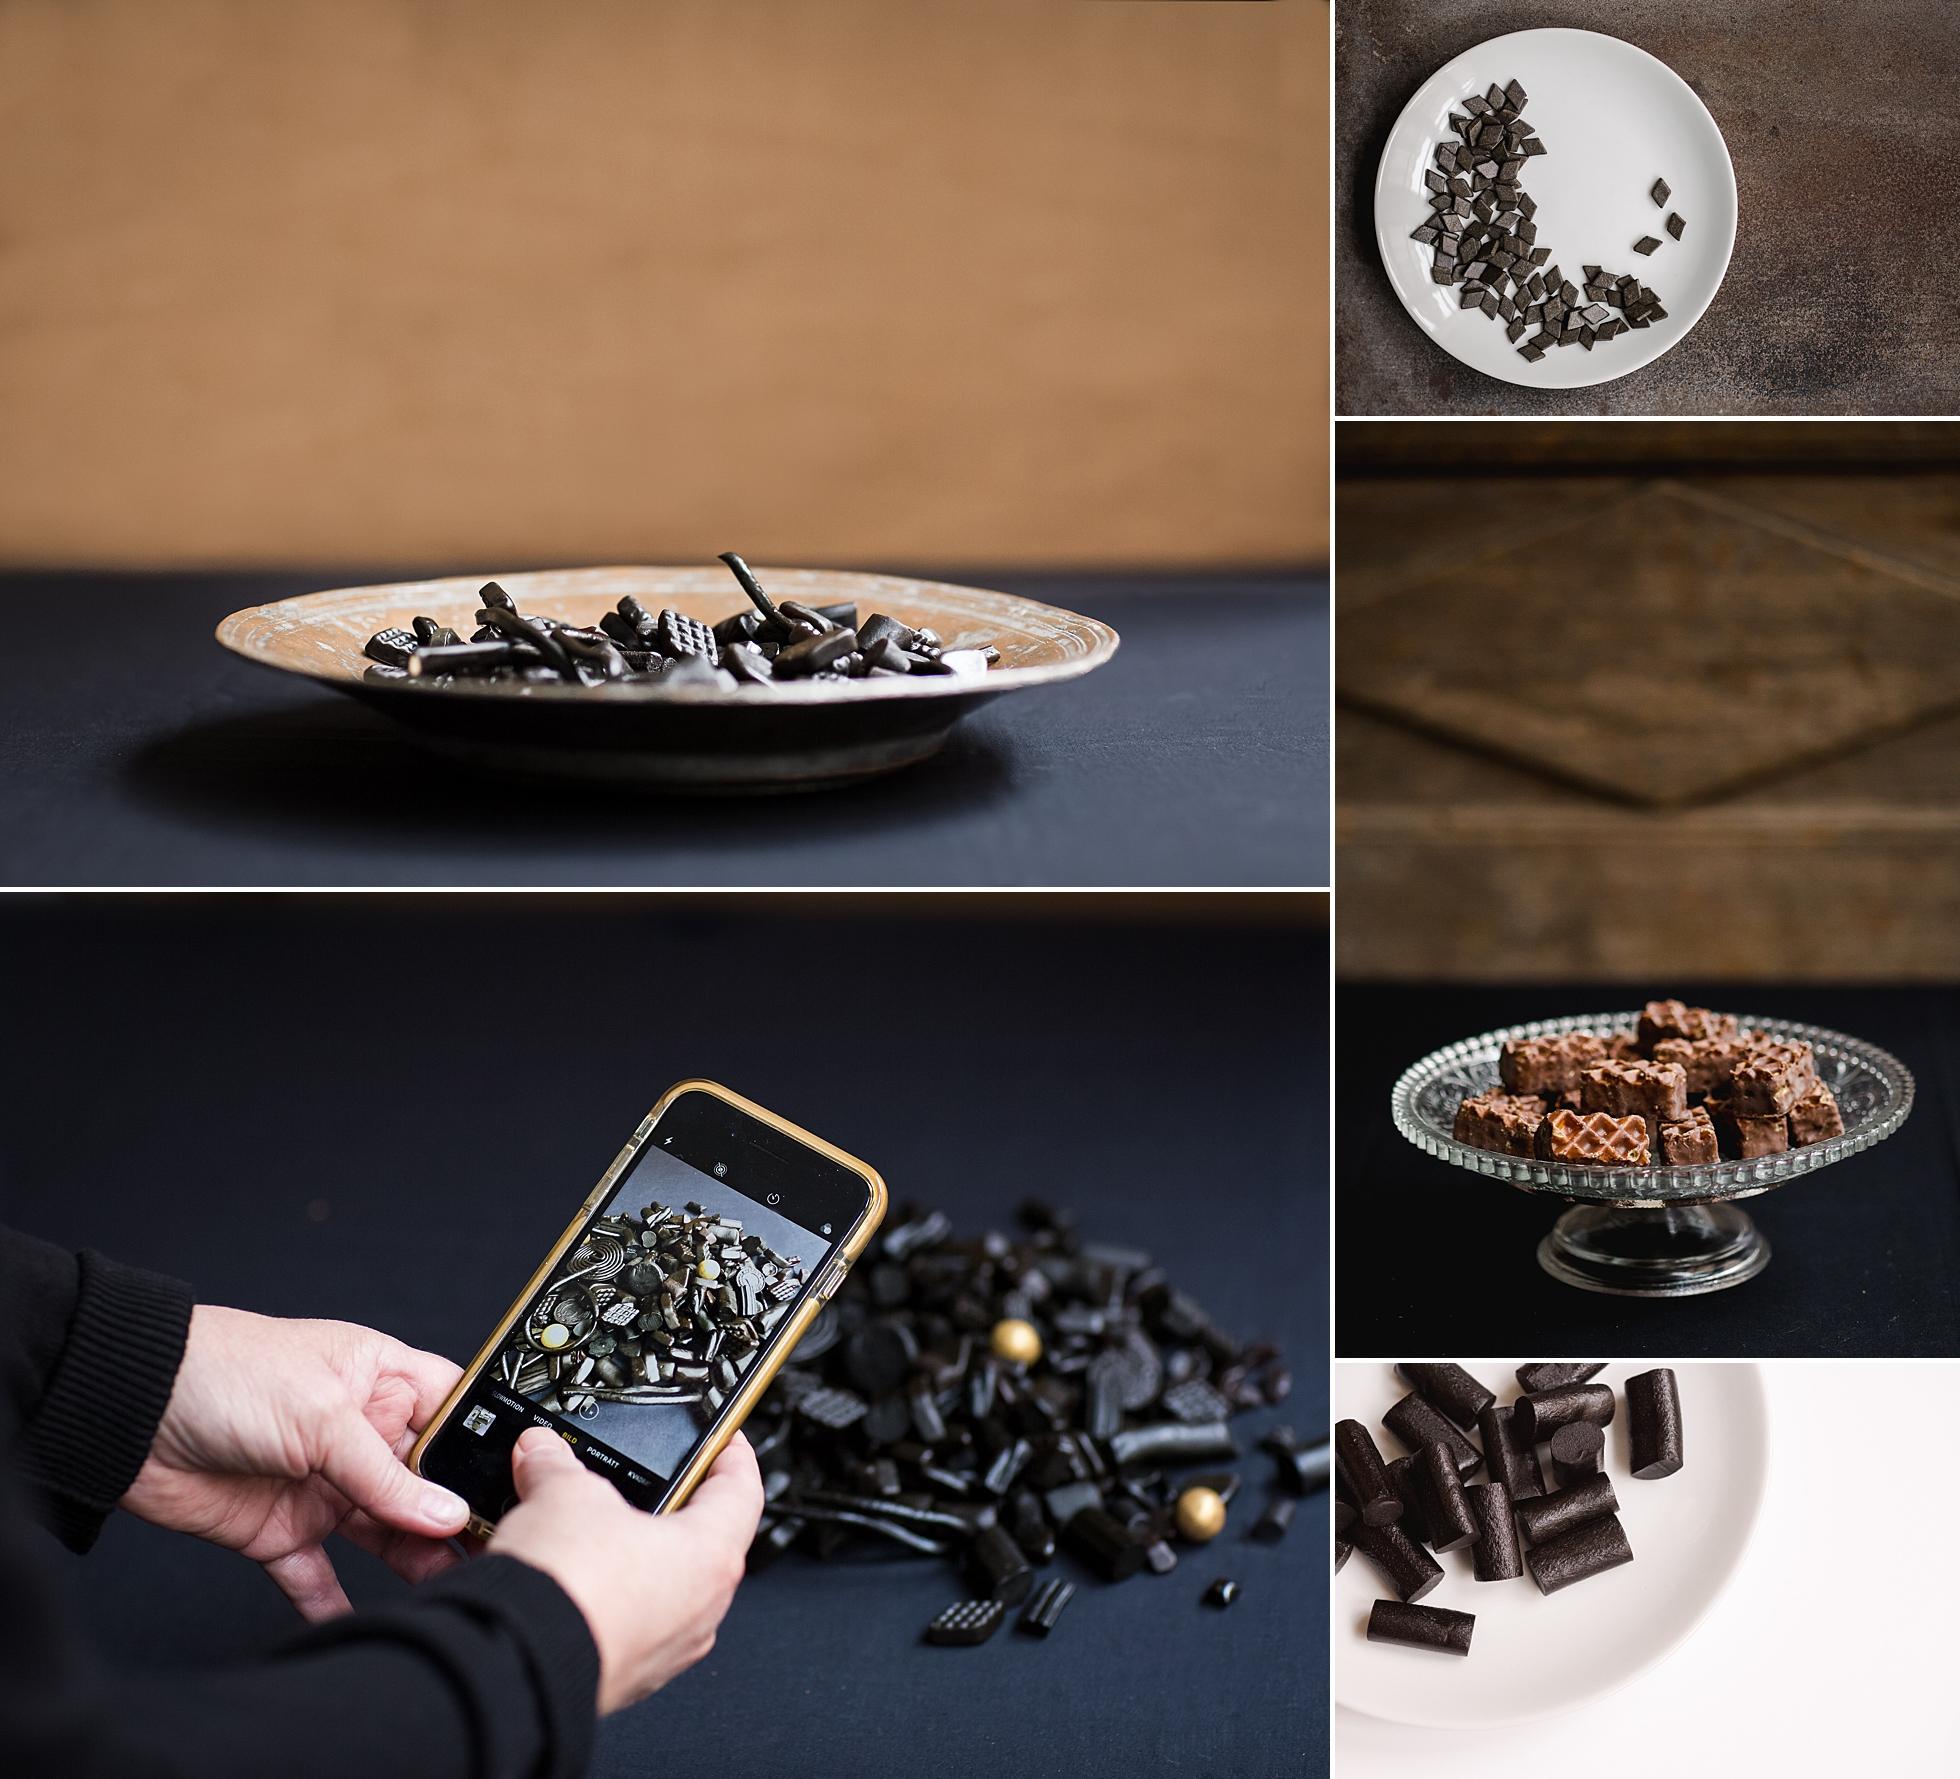 Product photos of liquorice and chocolate